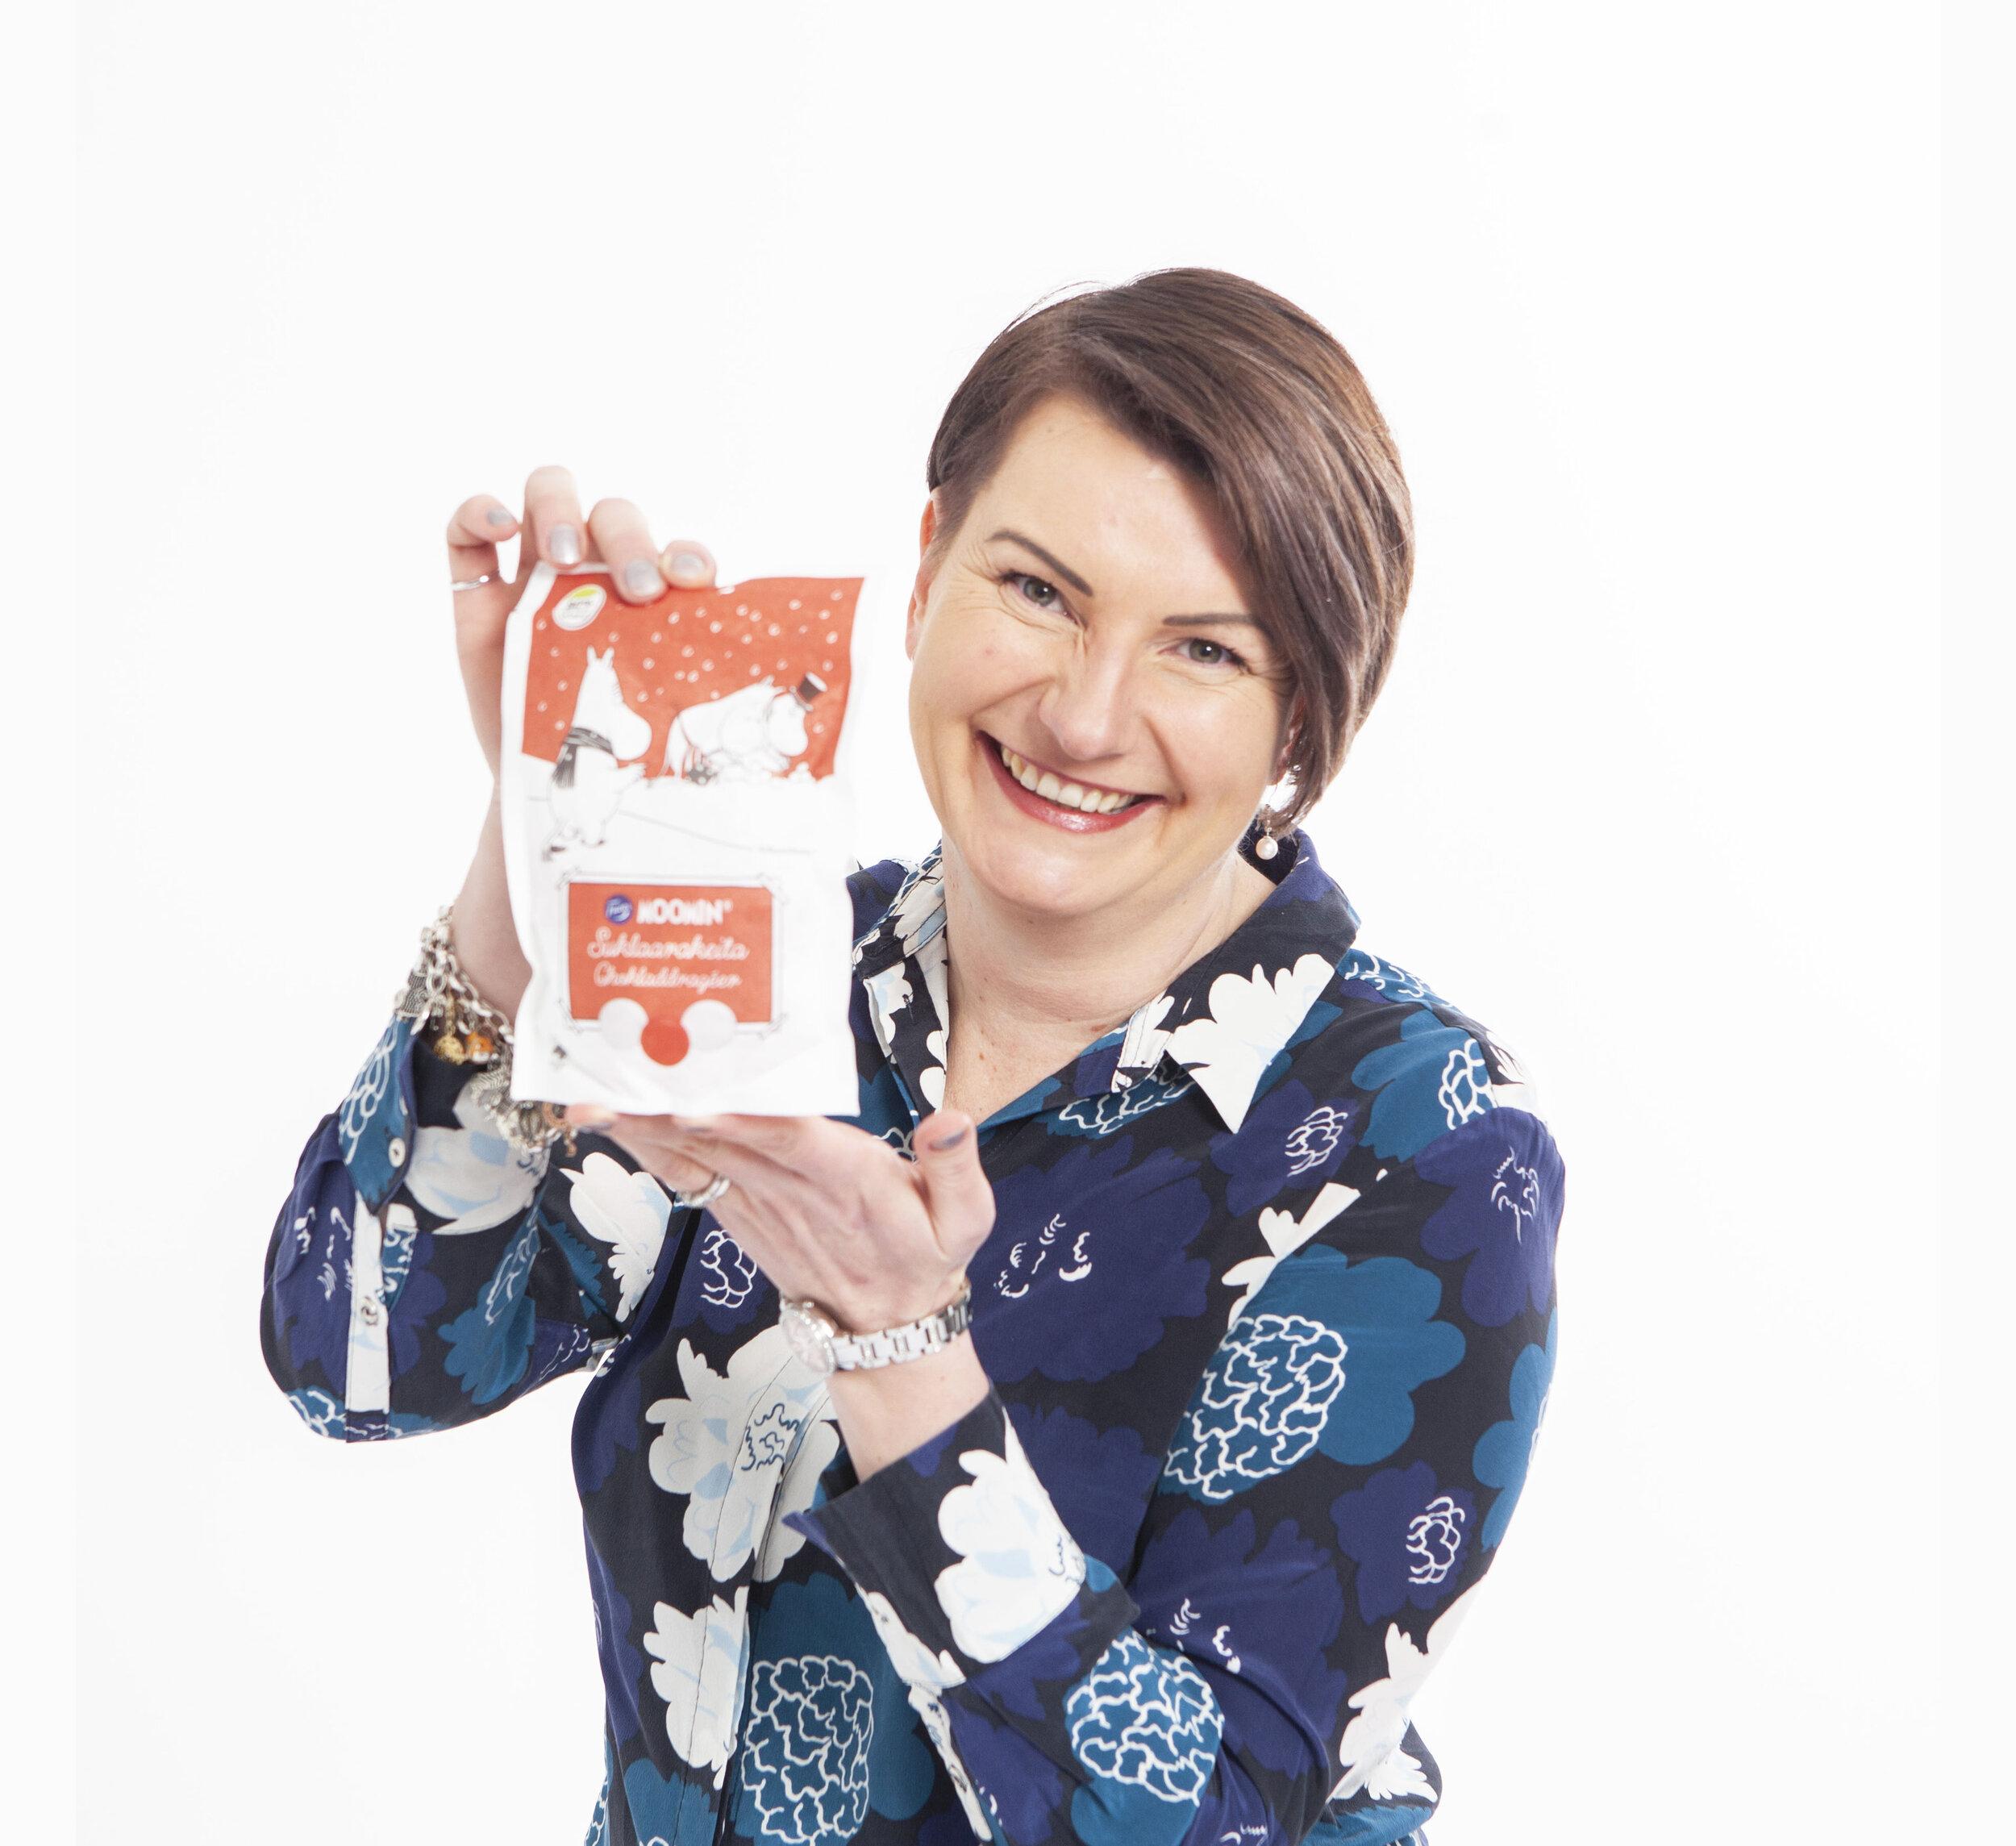 Katja Jokiaho -业务发展经理flexible Packagingkatja.jokiaho(at)www.gatemotion.com必威app精装版苹果版